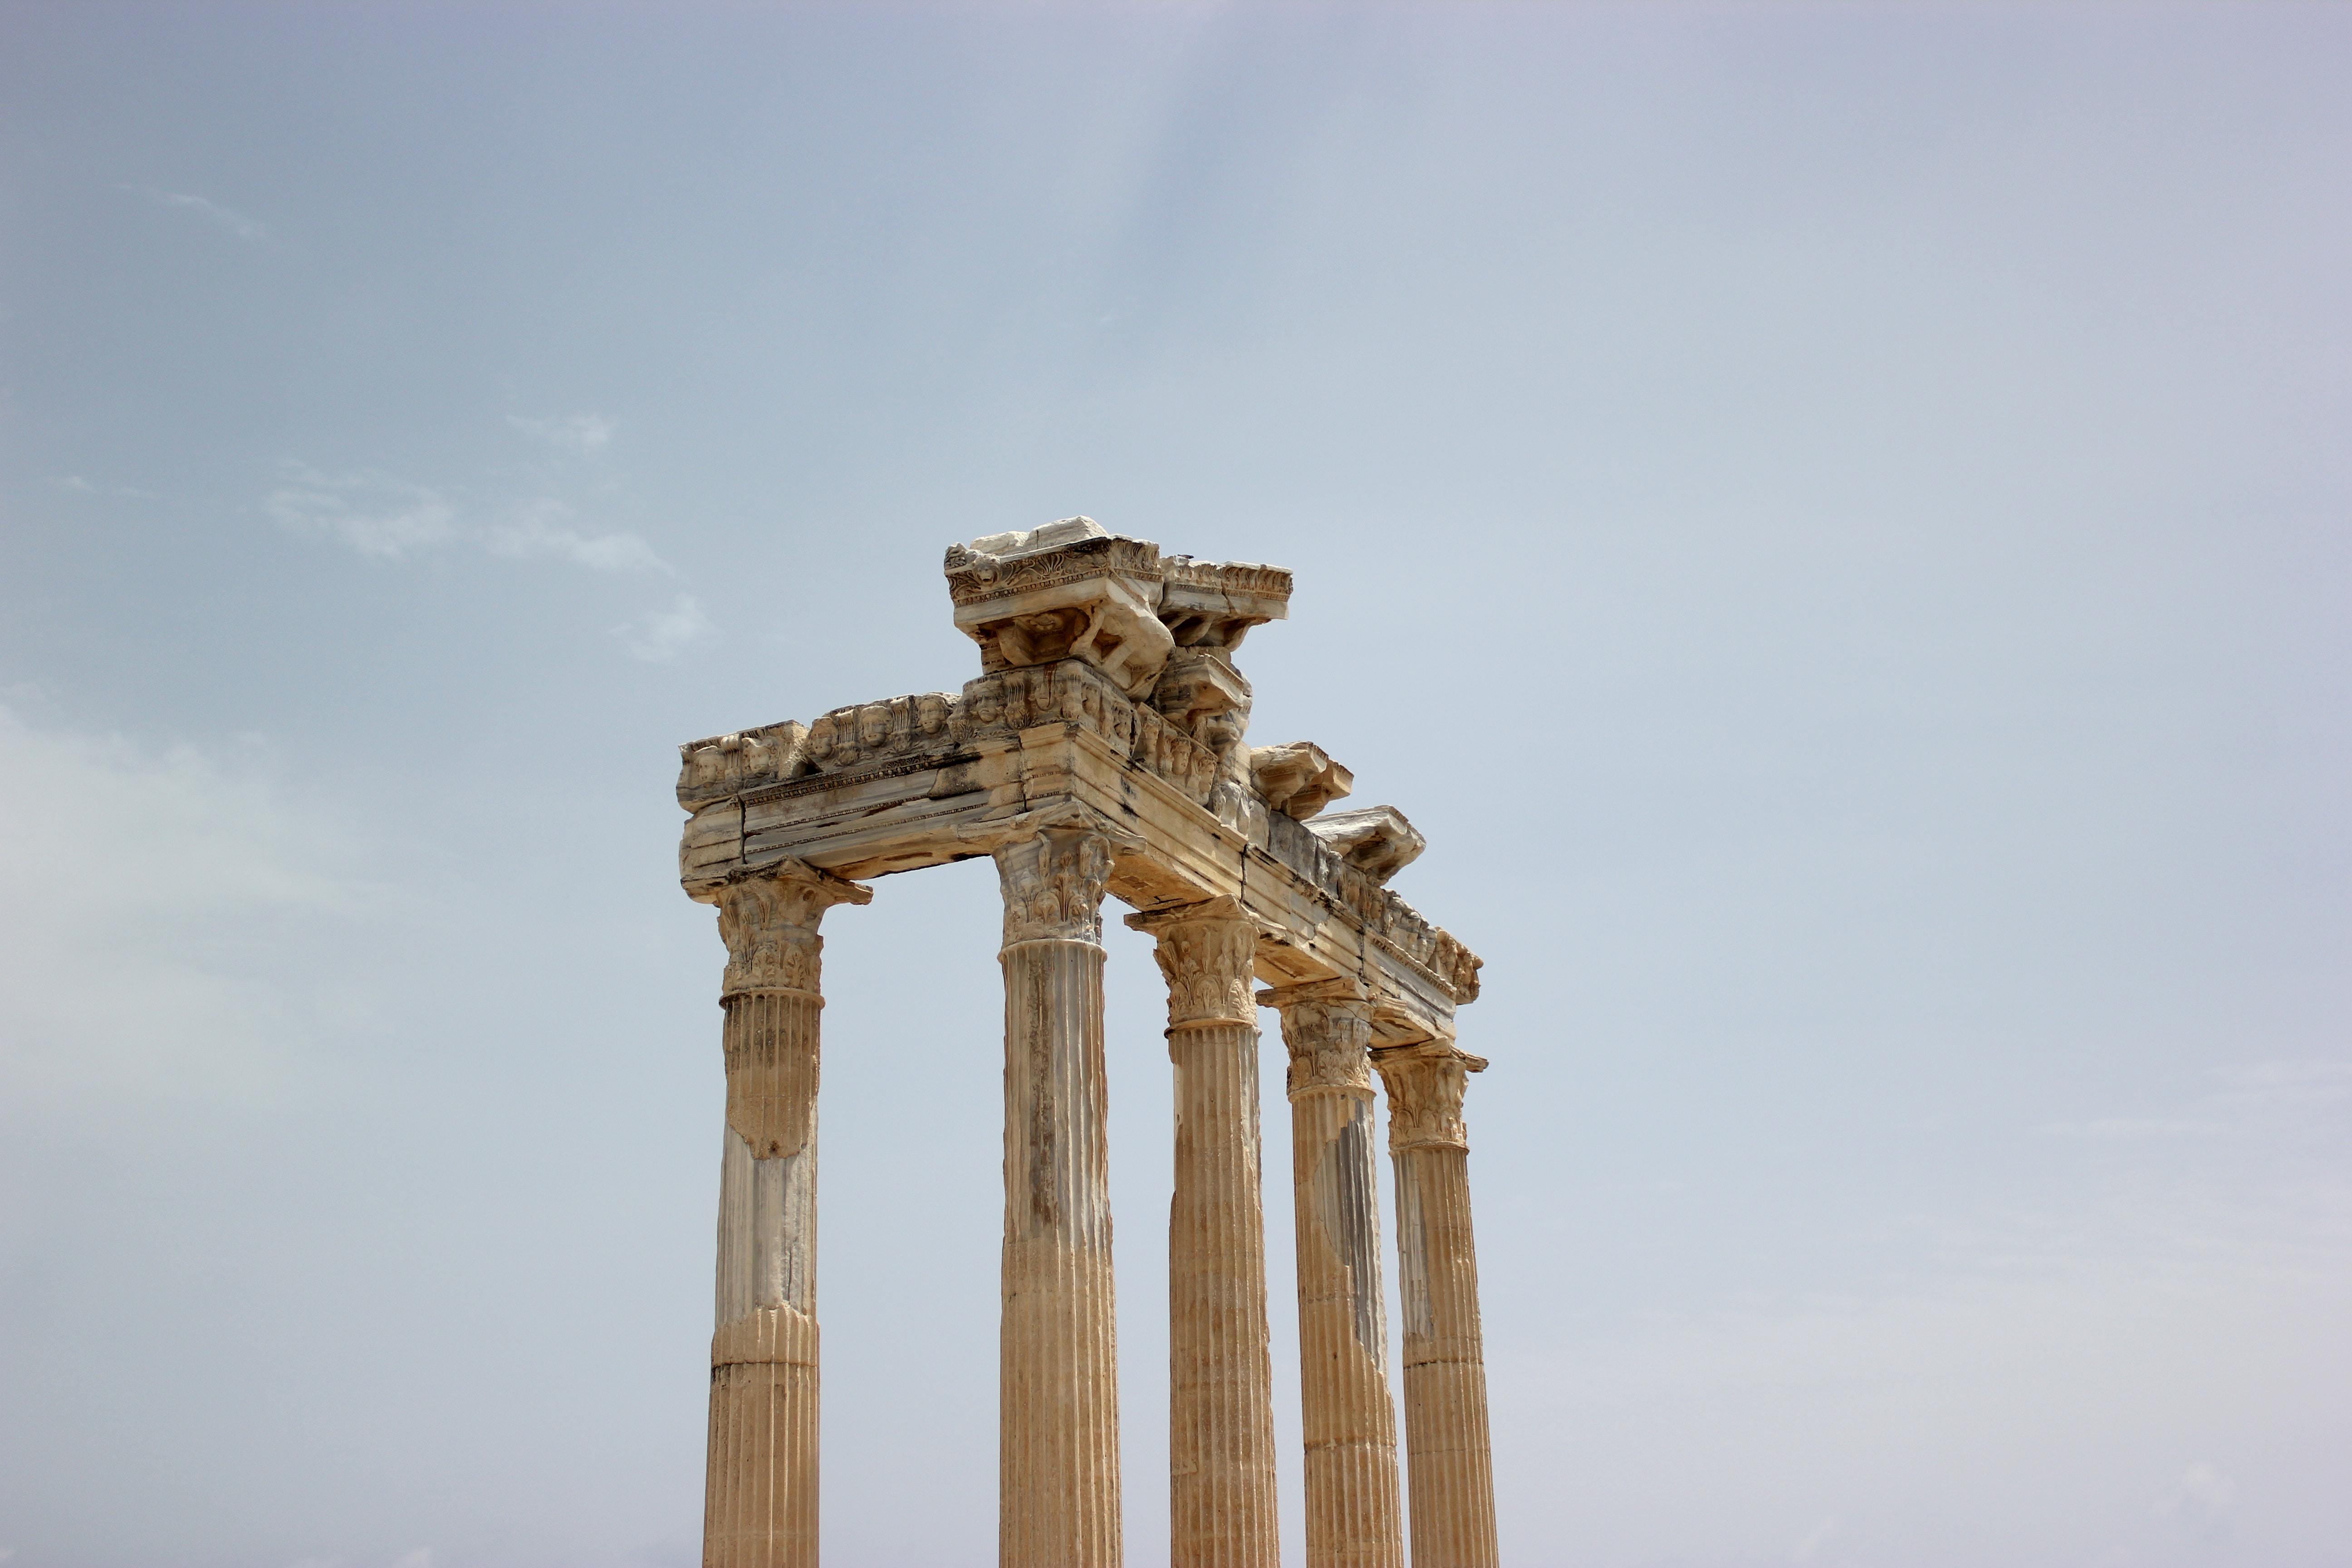 Pillars monument